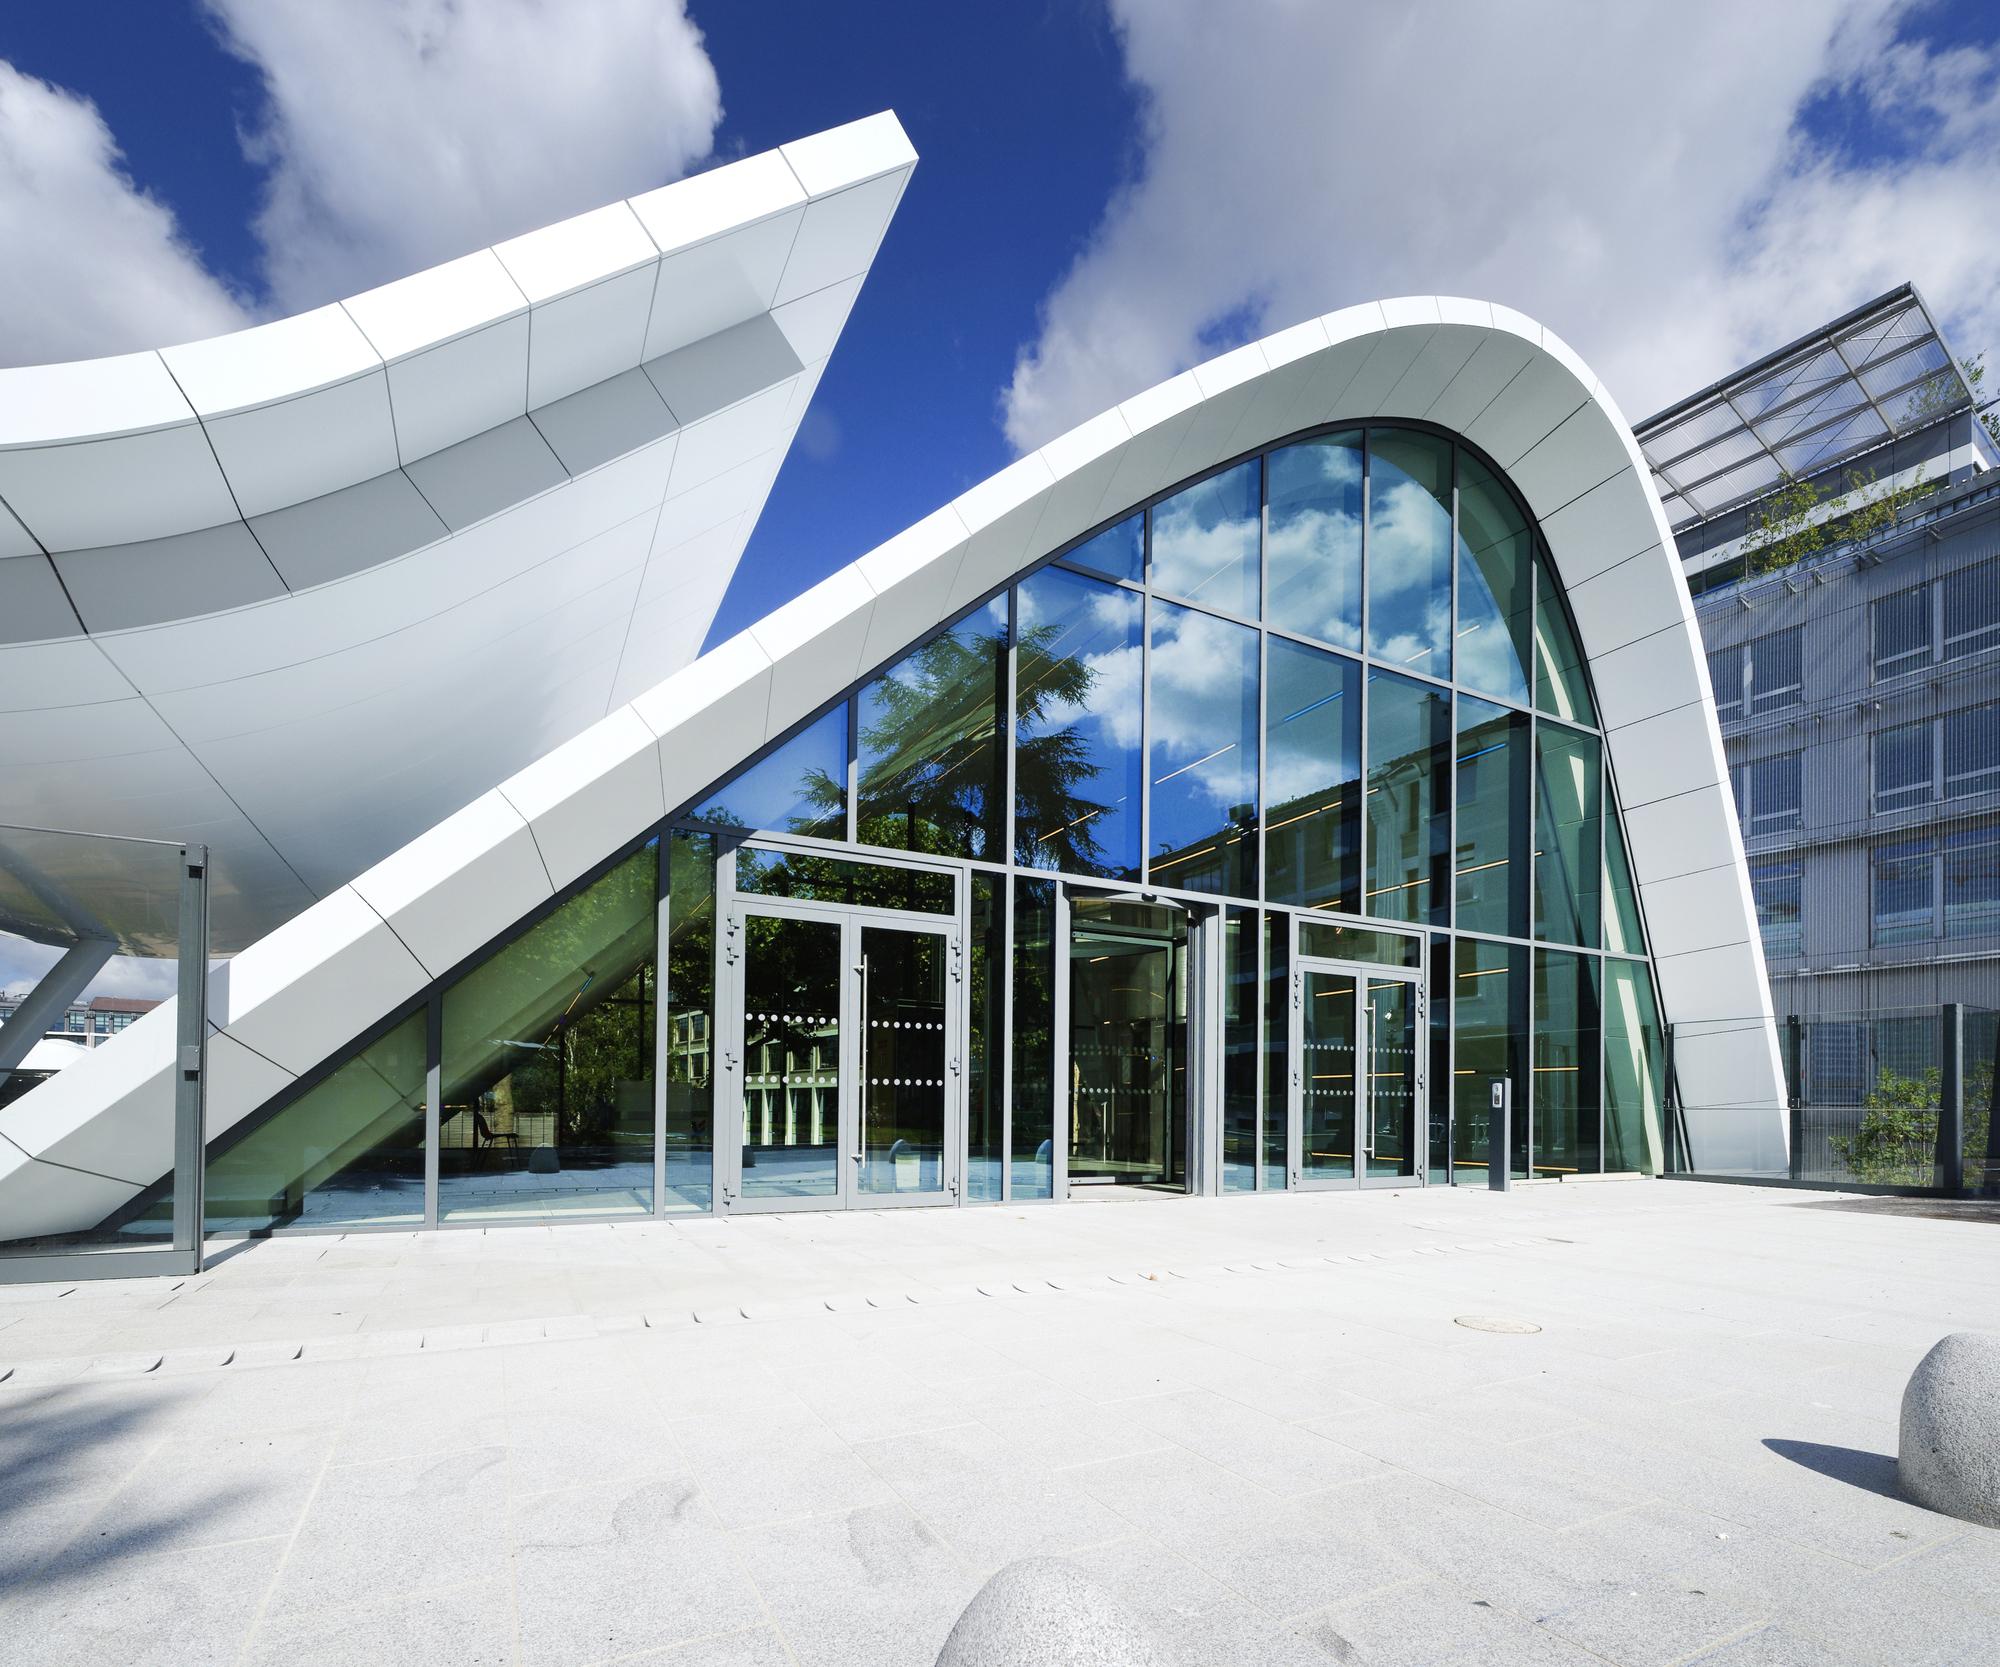 Galer a de pabell n campus evergreen arte charpentier for Accesos arquitectura